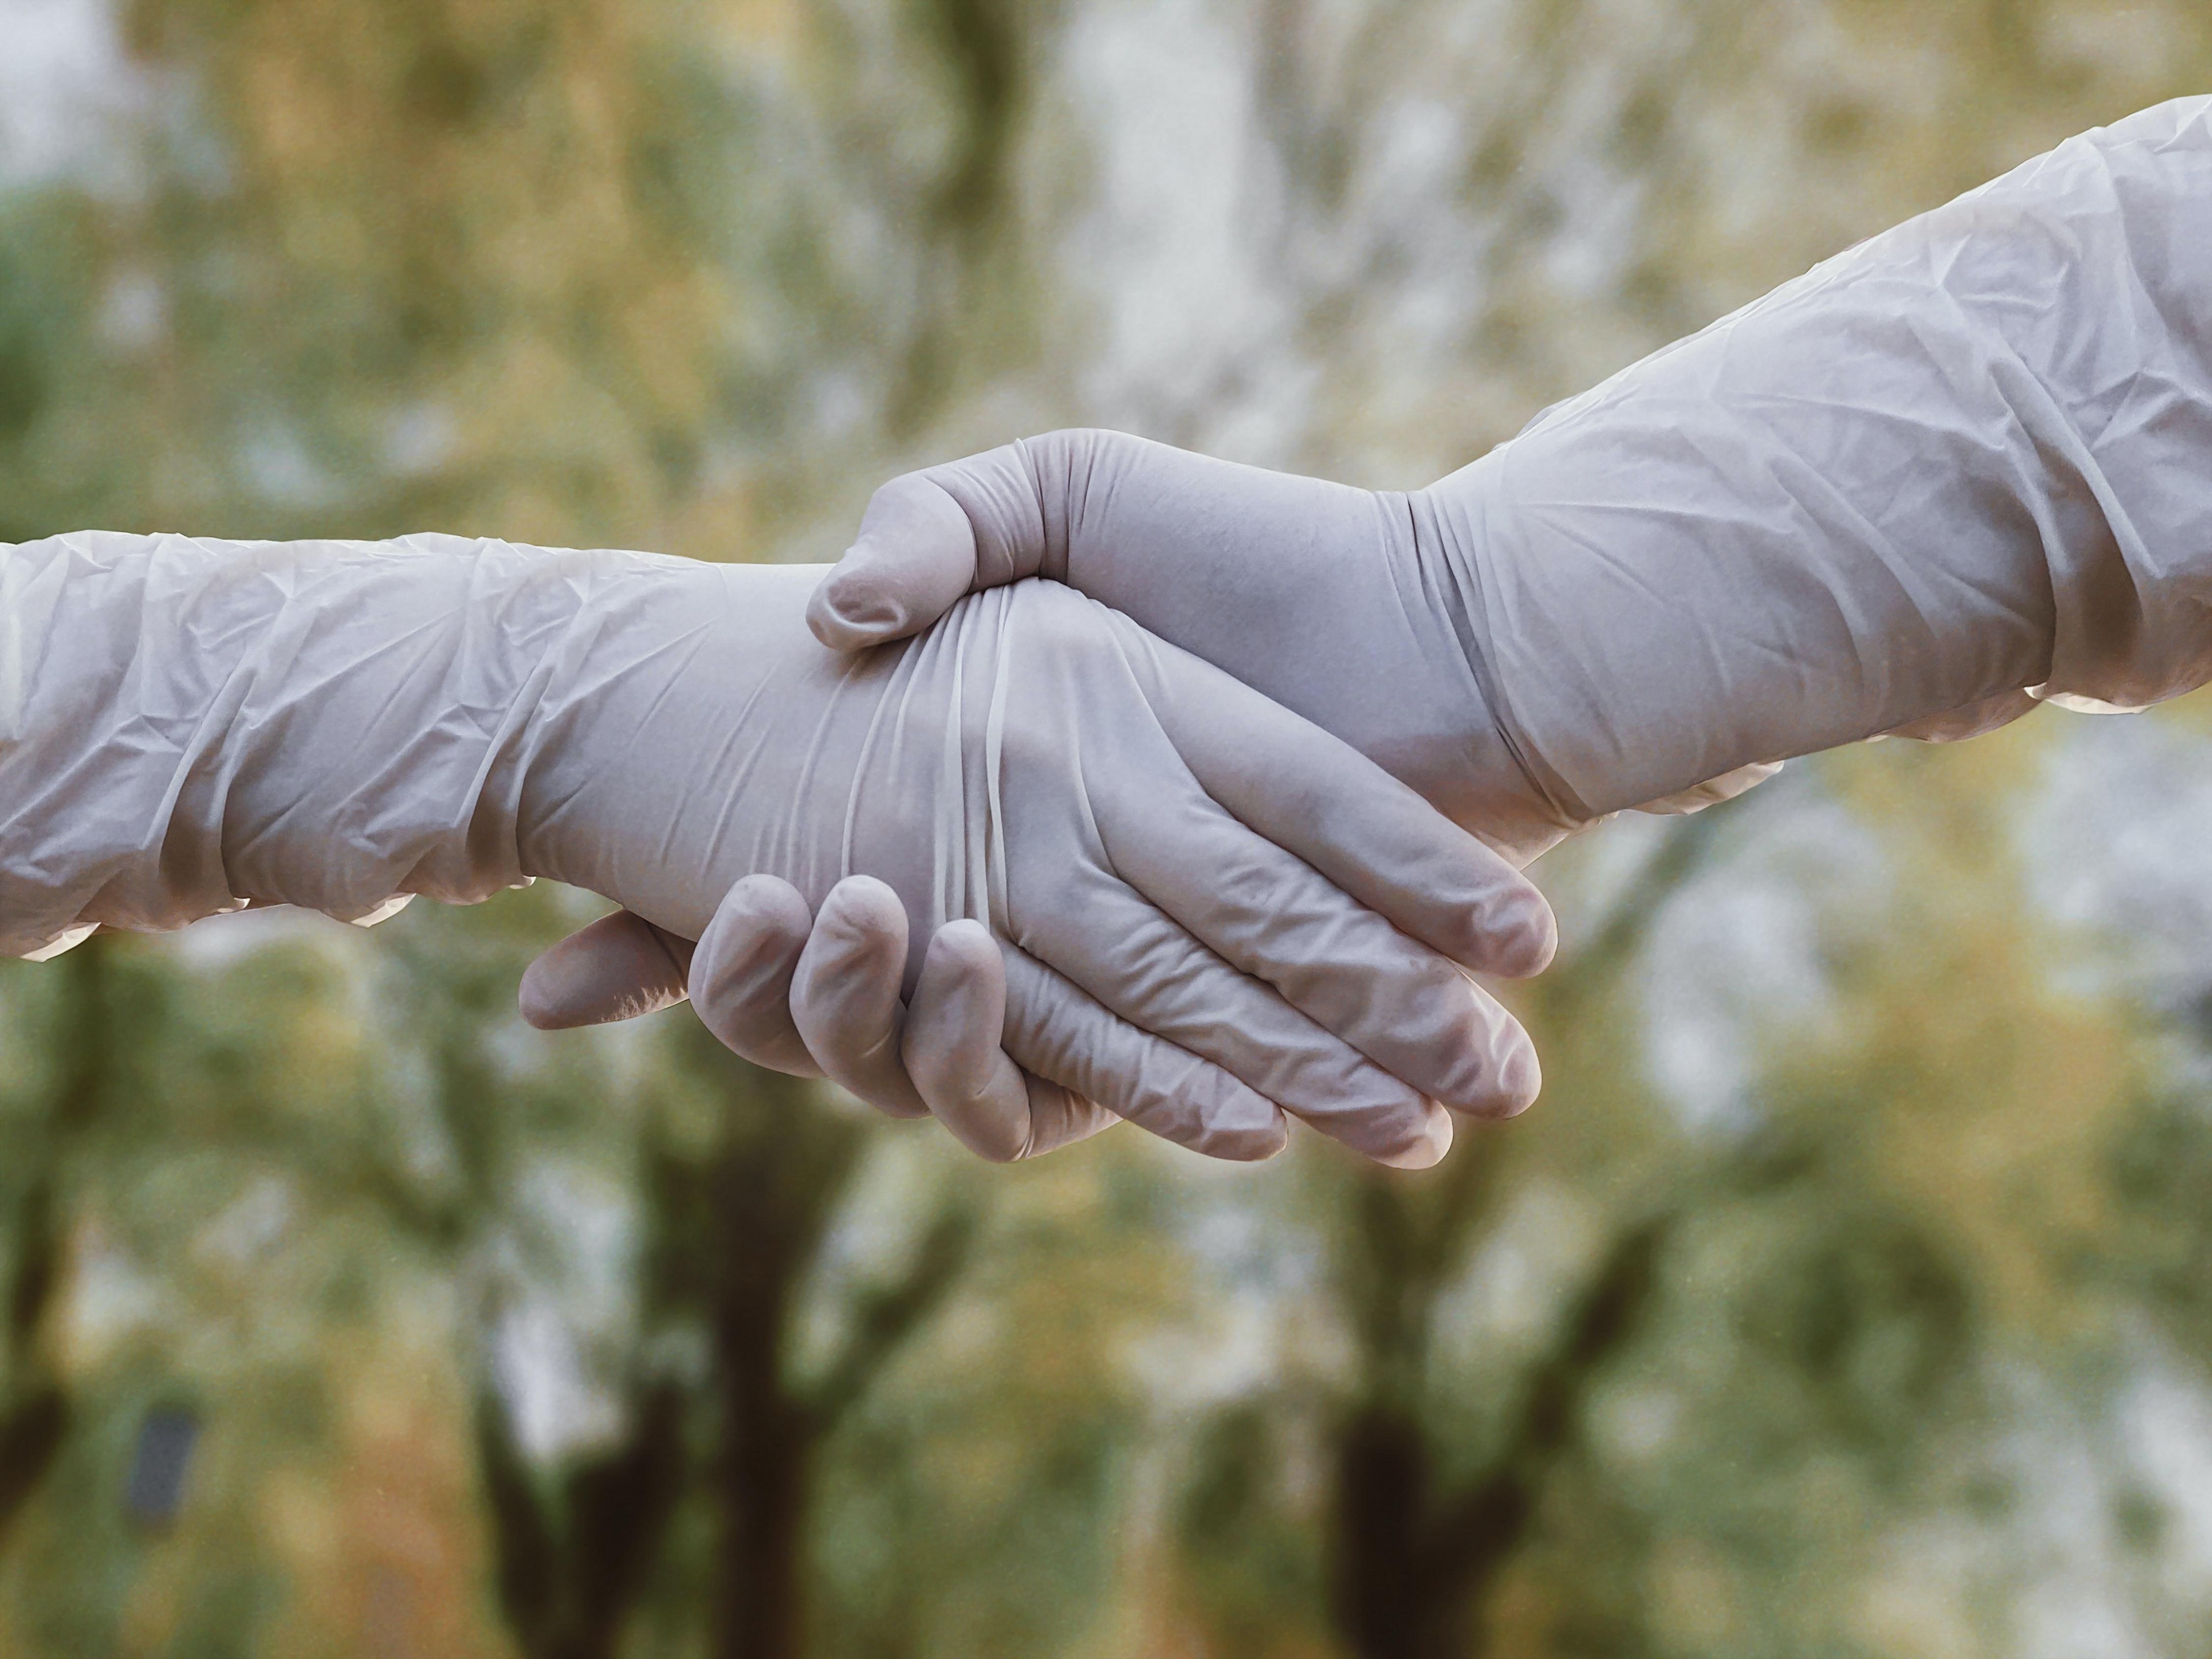 "img alt"" Covid-19 handshake, gloves, stay safe, prevent transmission"""